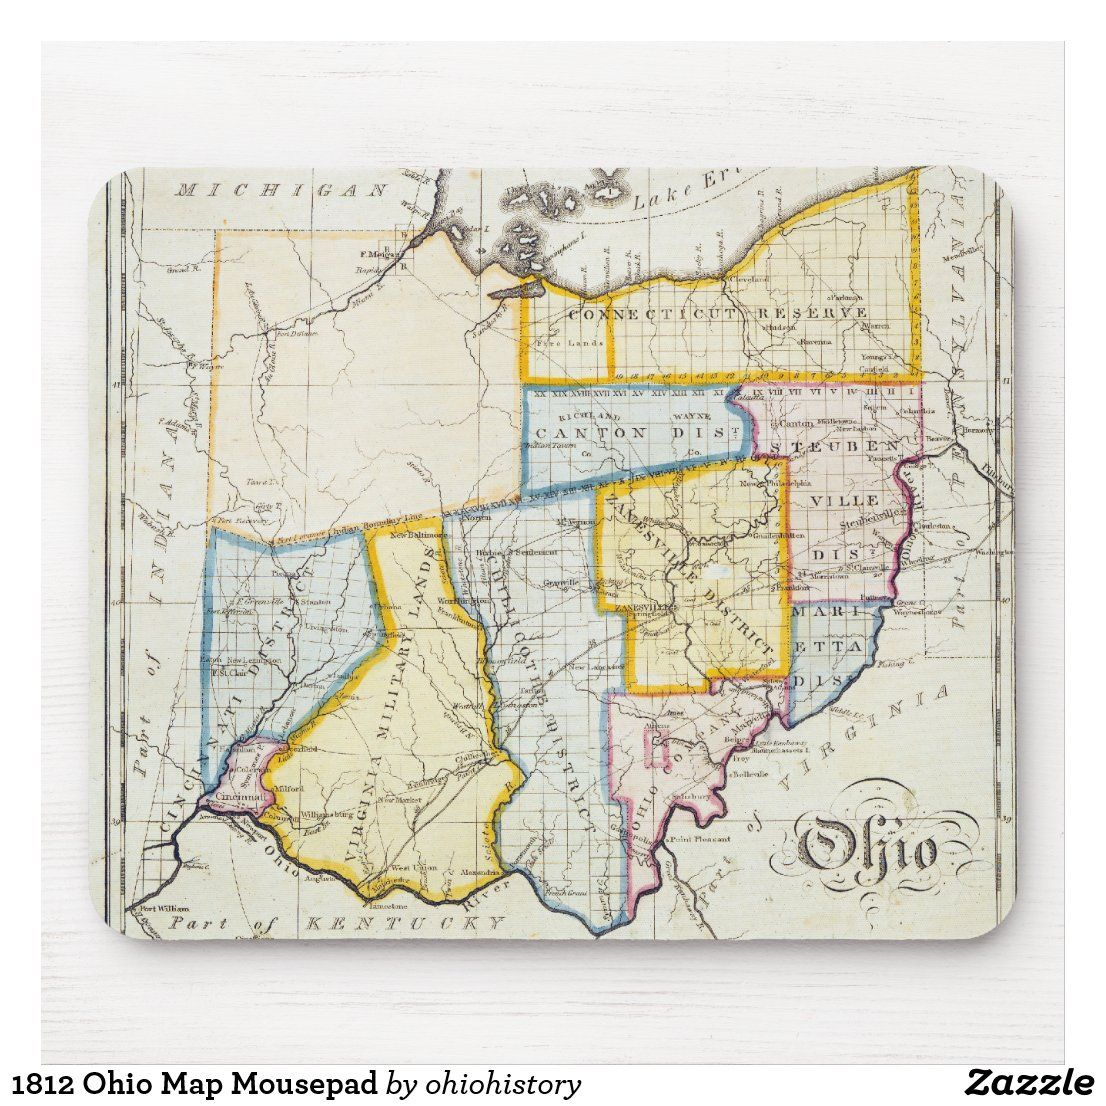 Craigslist Materials Lima Ohio - LISTCRAG